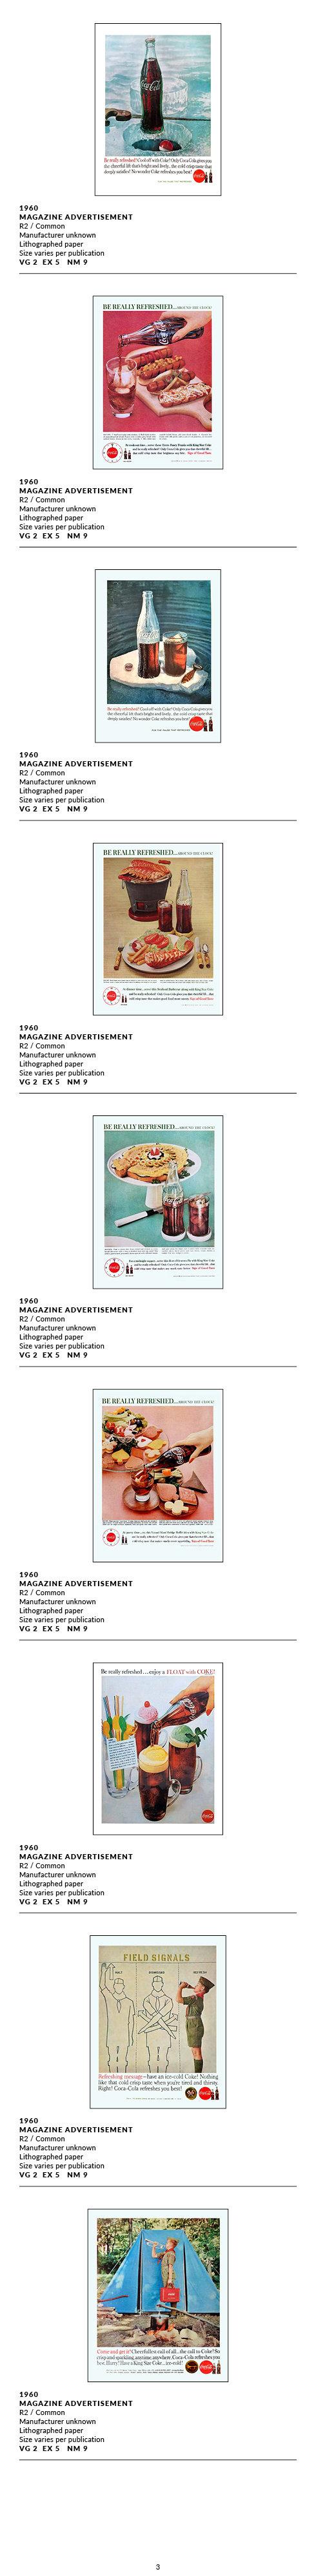 Desktop 1960-64 Ads Master3.jpg